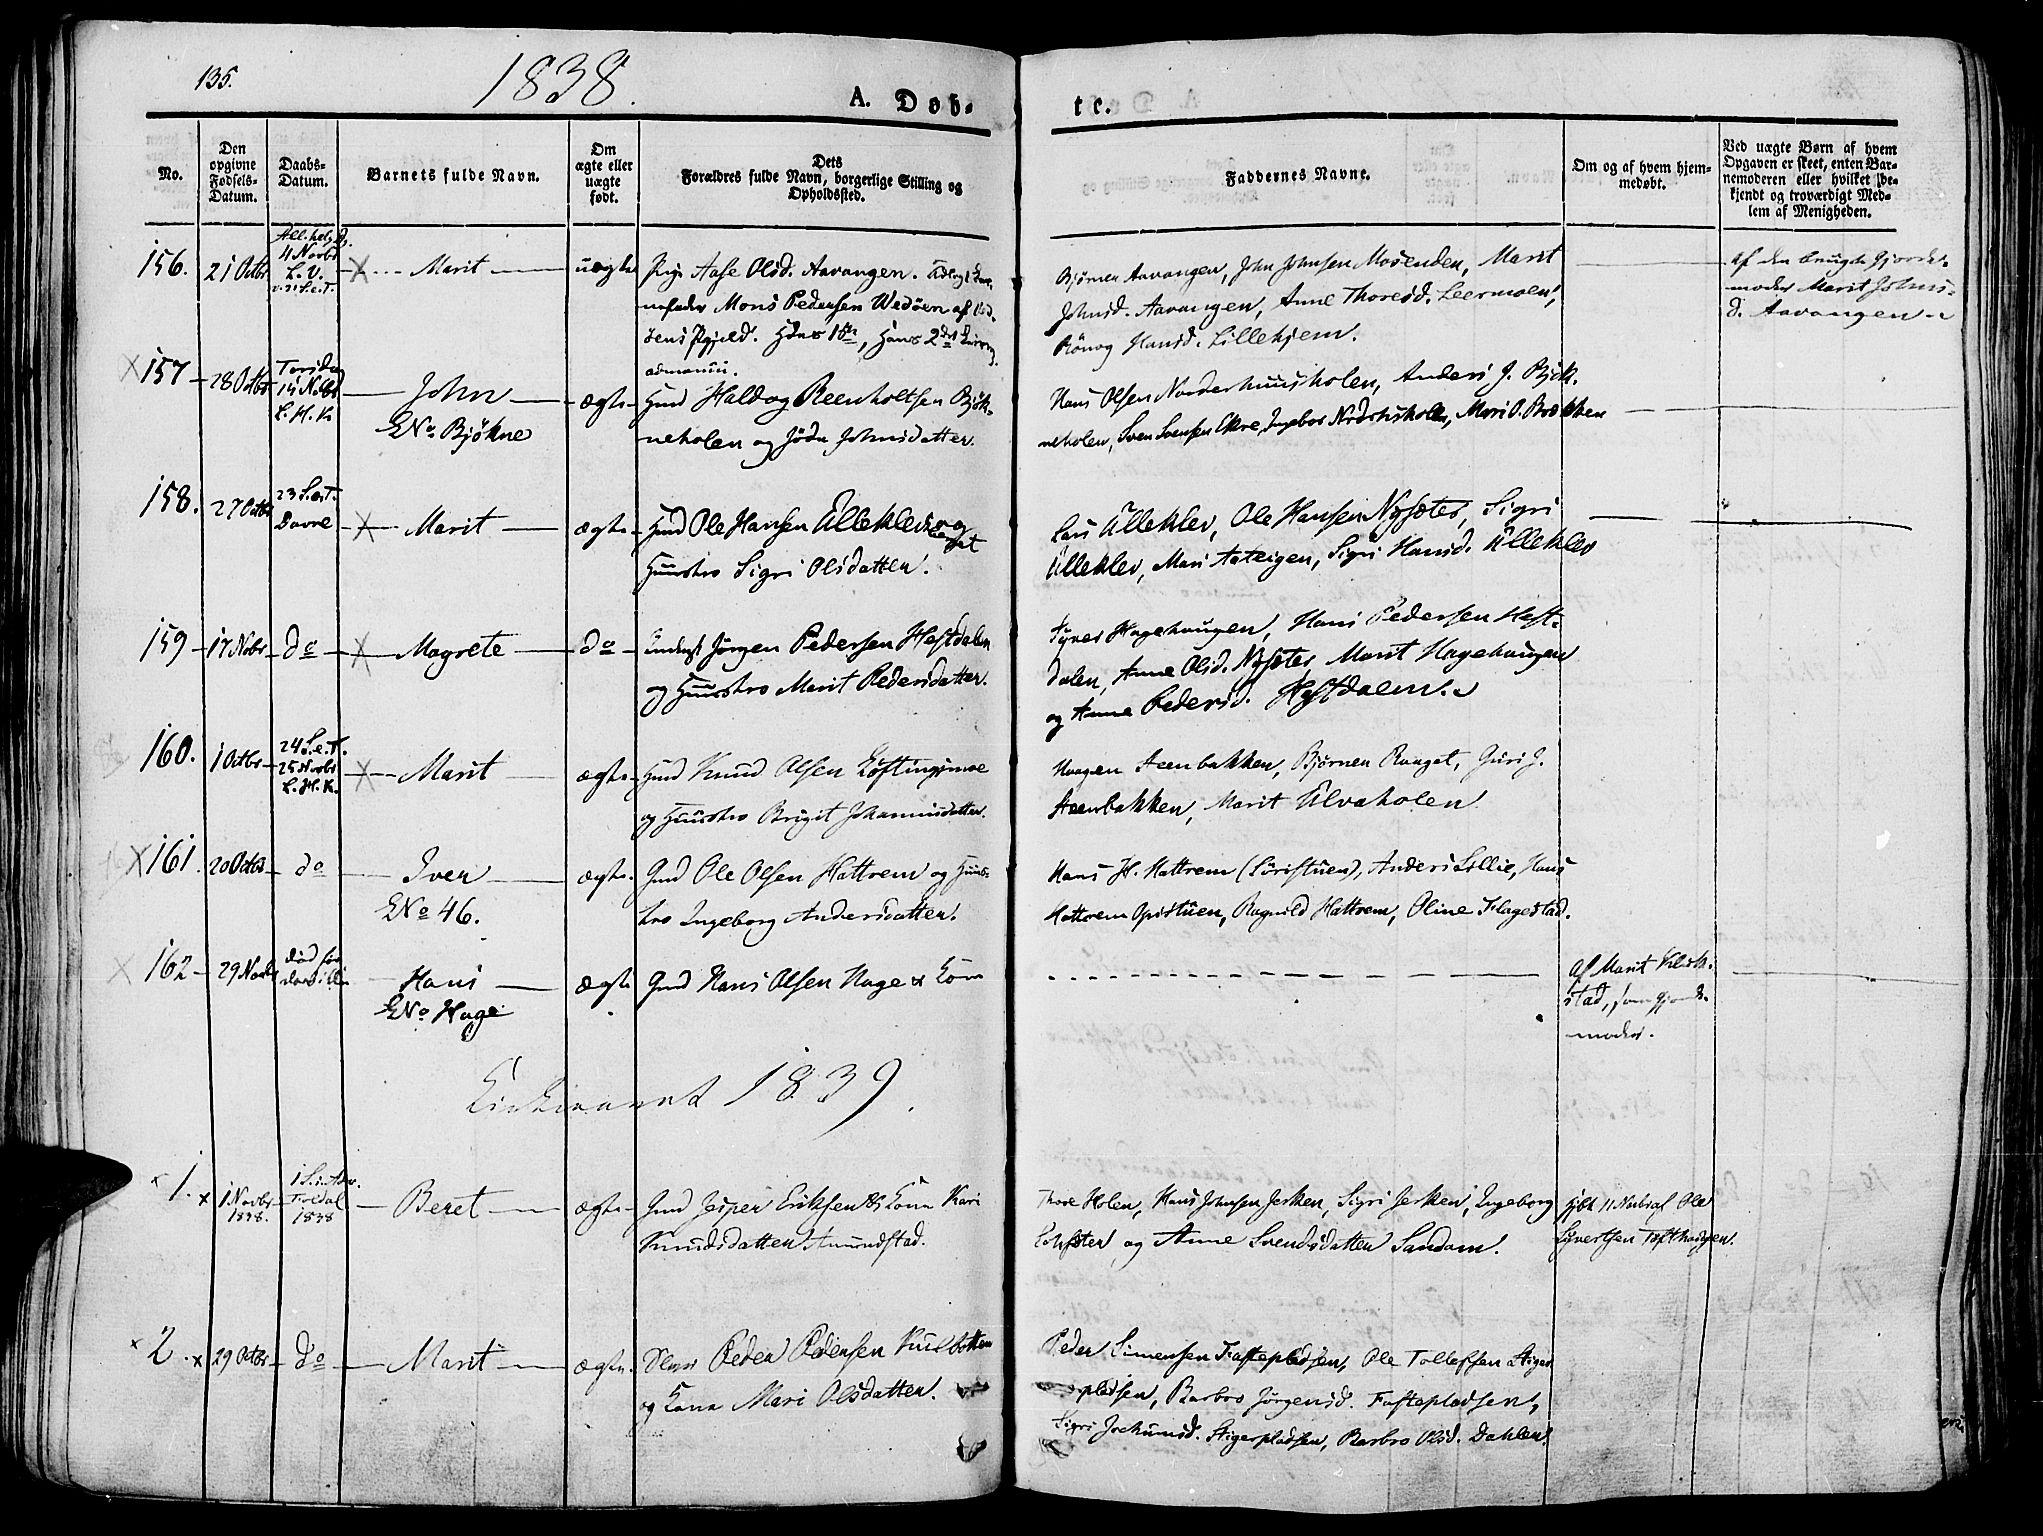 SAH, Lesja prestekontor, Ministerialbok nr. 5, 1830-1842, s. 135